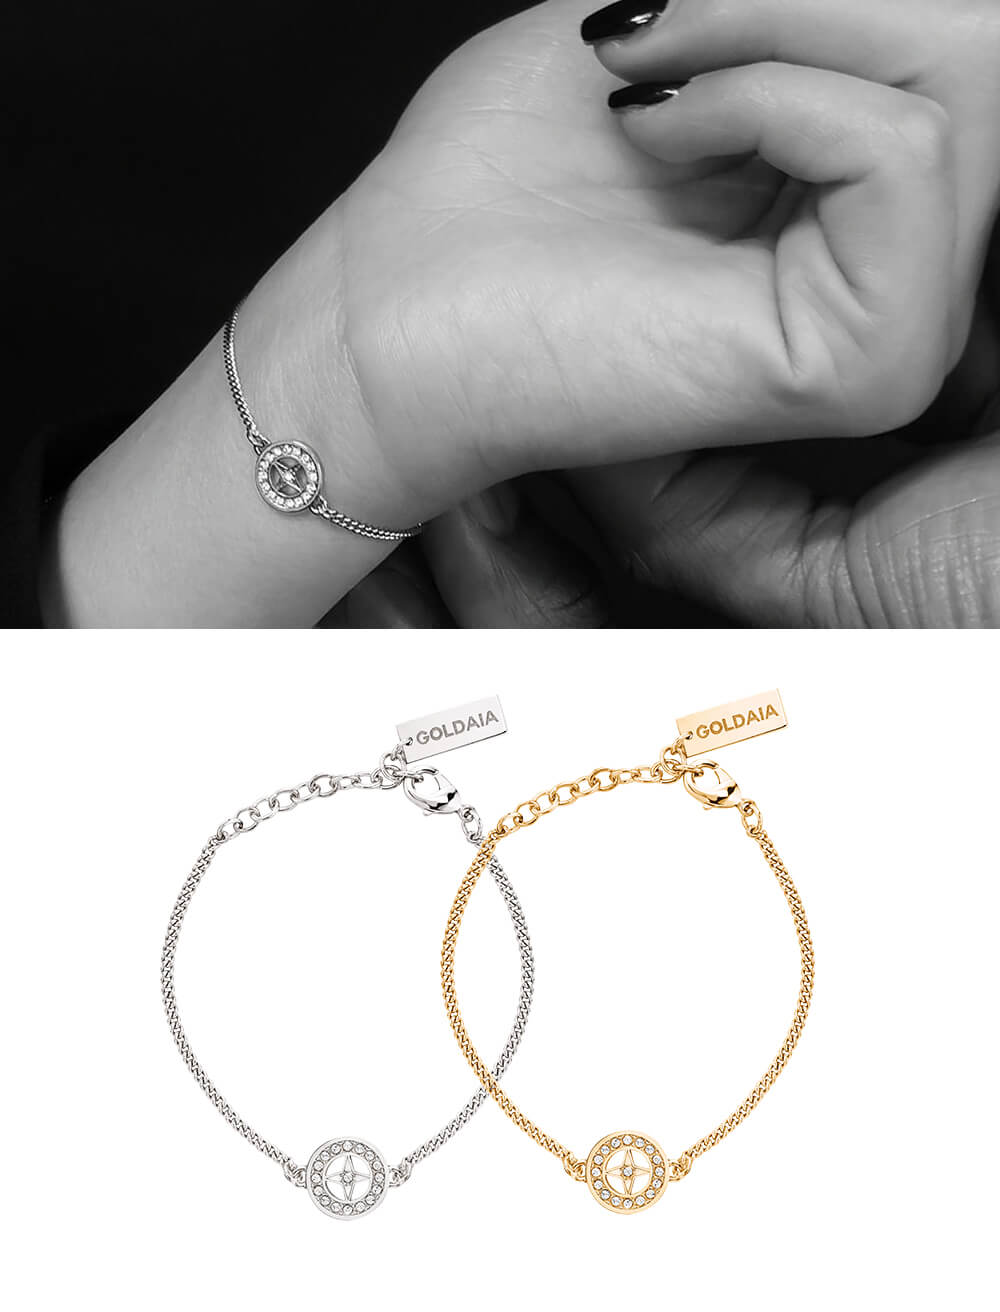 bijoux-femme-bracelet